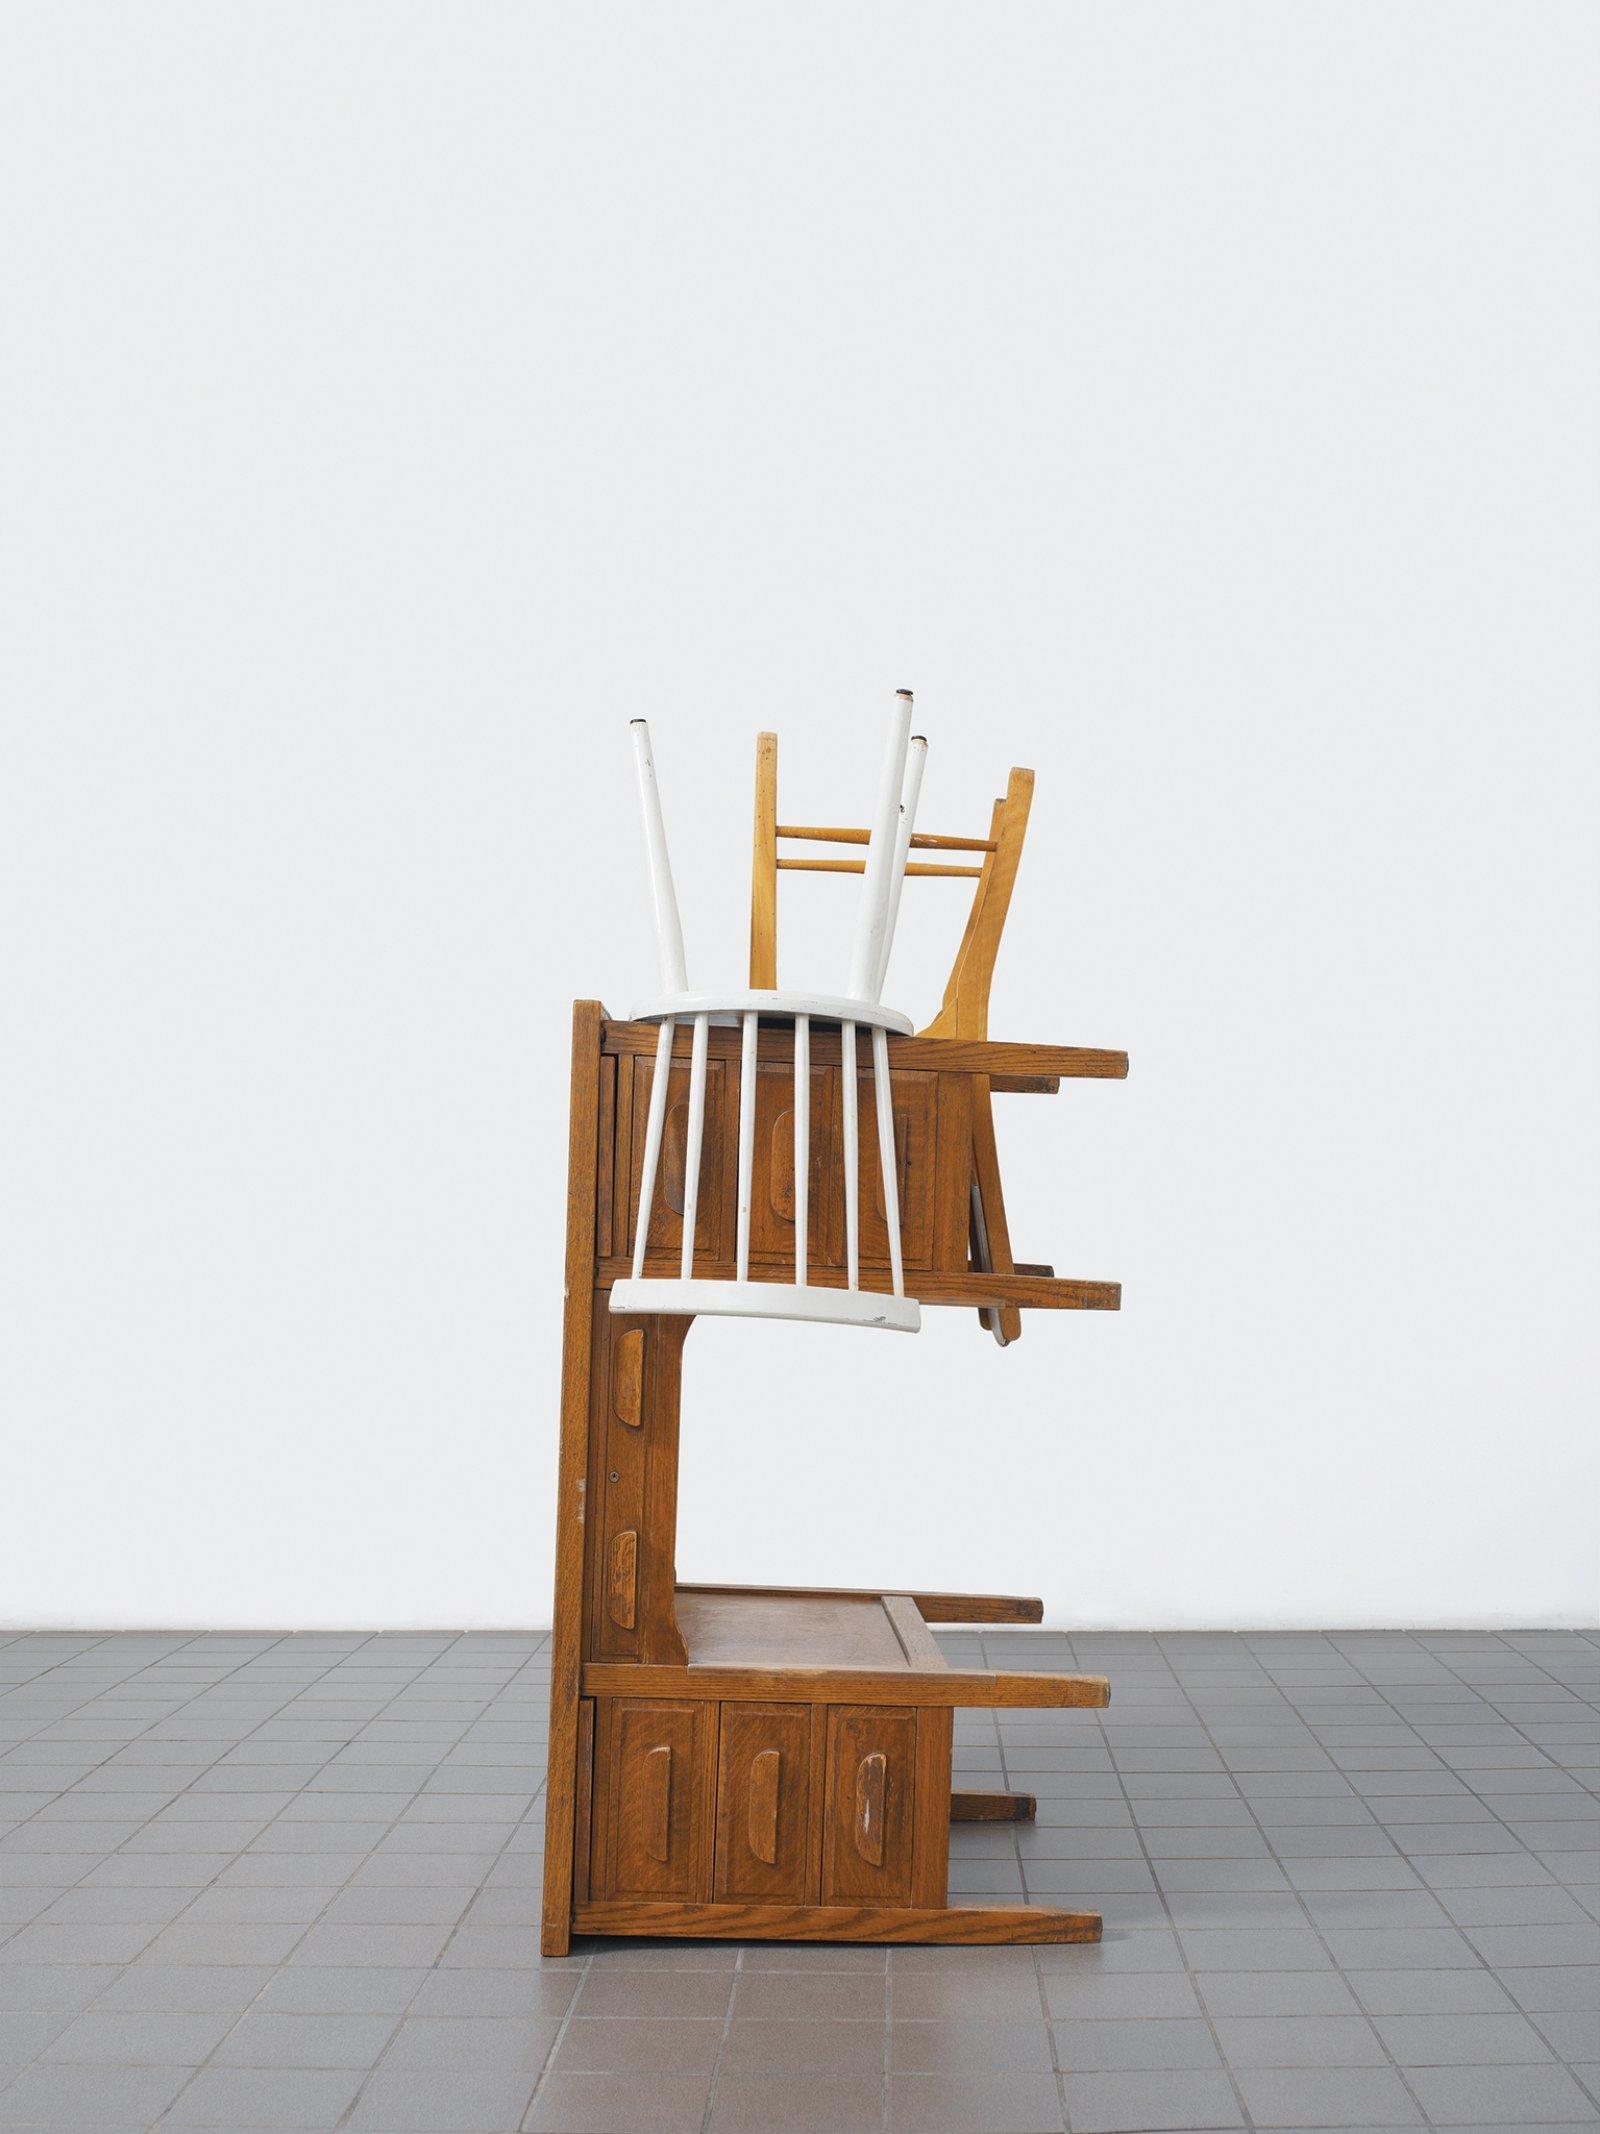 Geoffrey Farmer, Cage Work (Pale Fire Freedom Machine), 2005, lightjet (endura archival photo paper), 50 x 38 in. (126 x 97 cm)